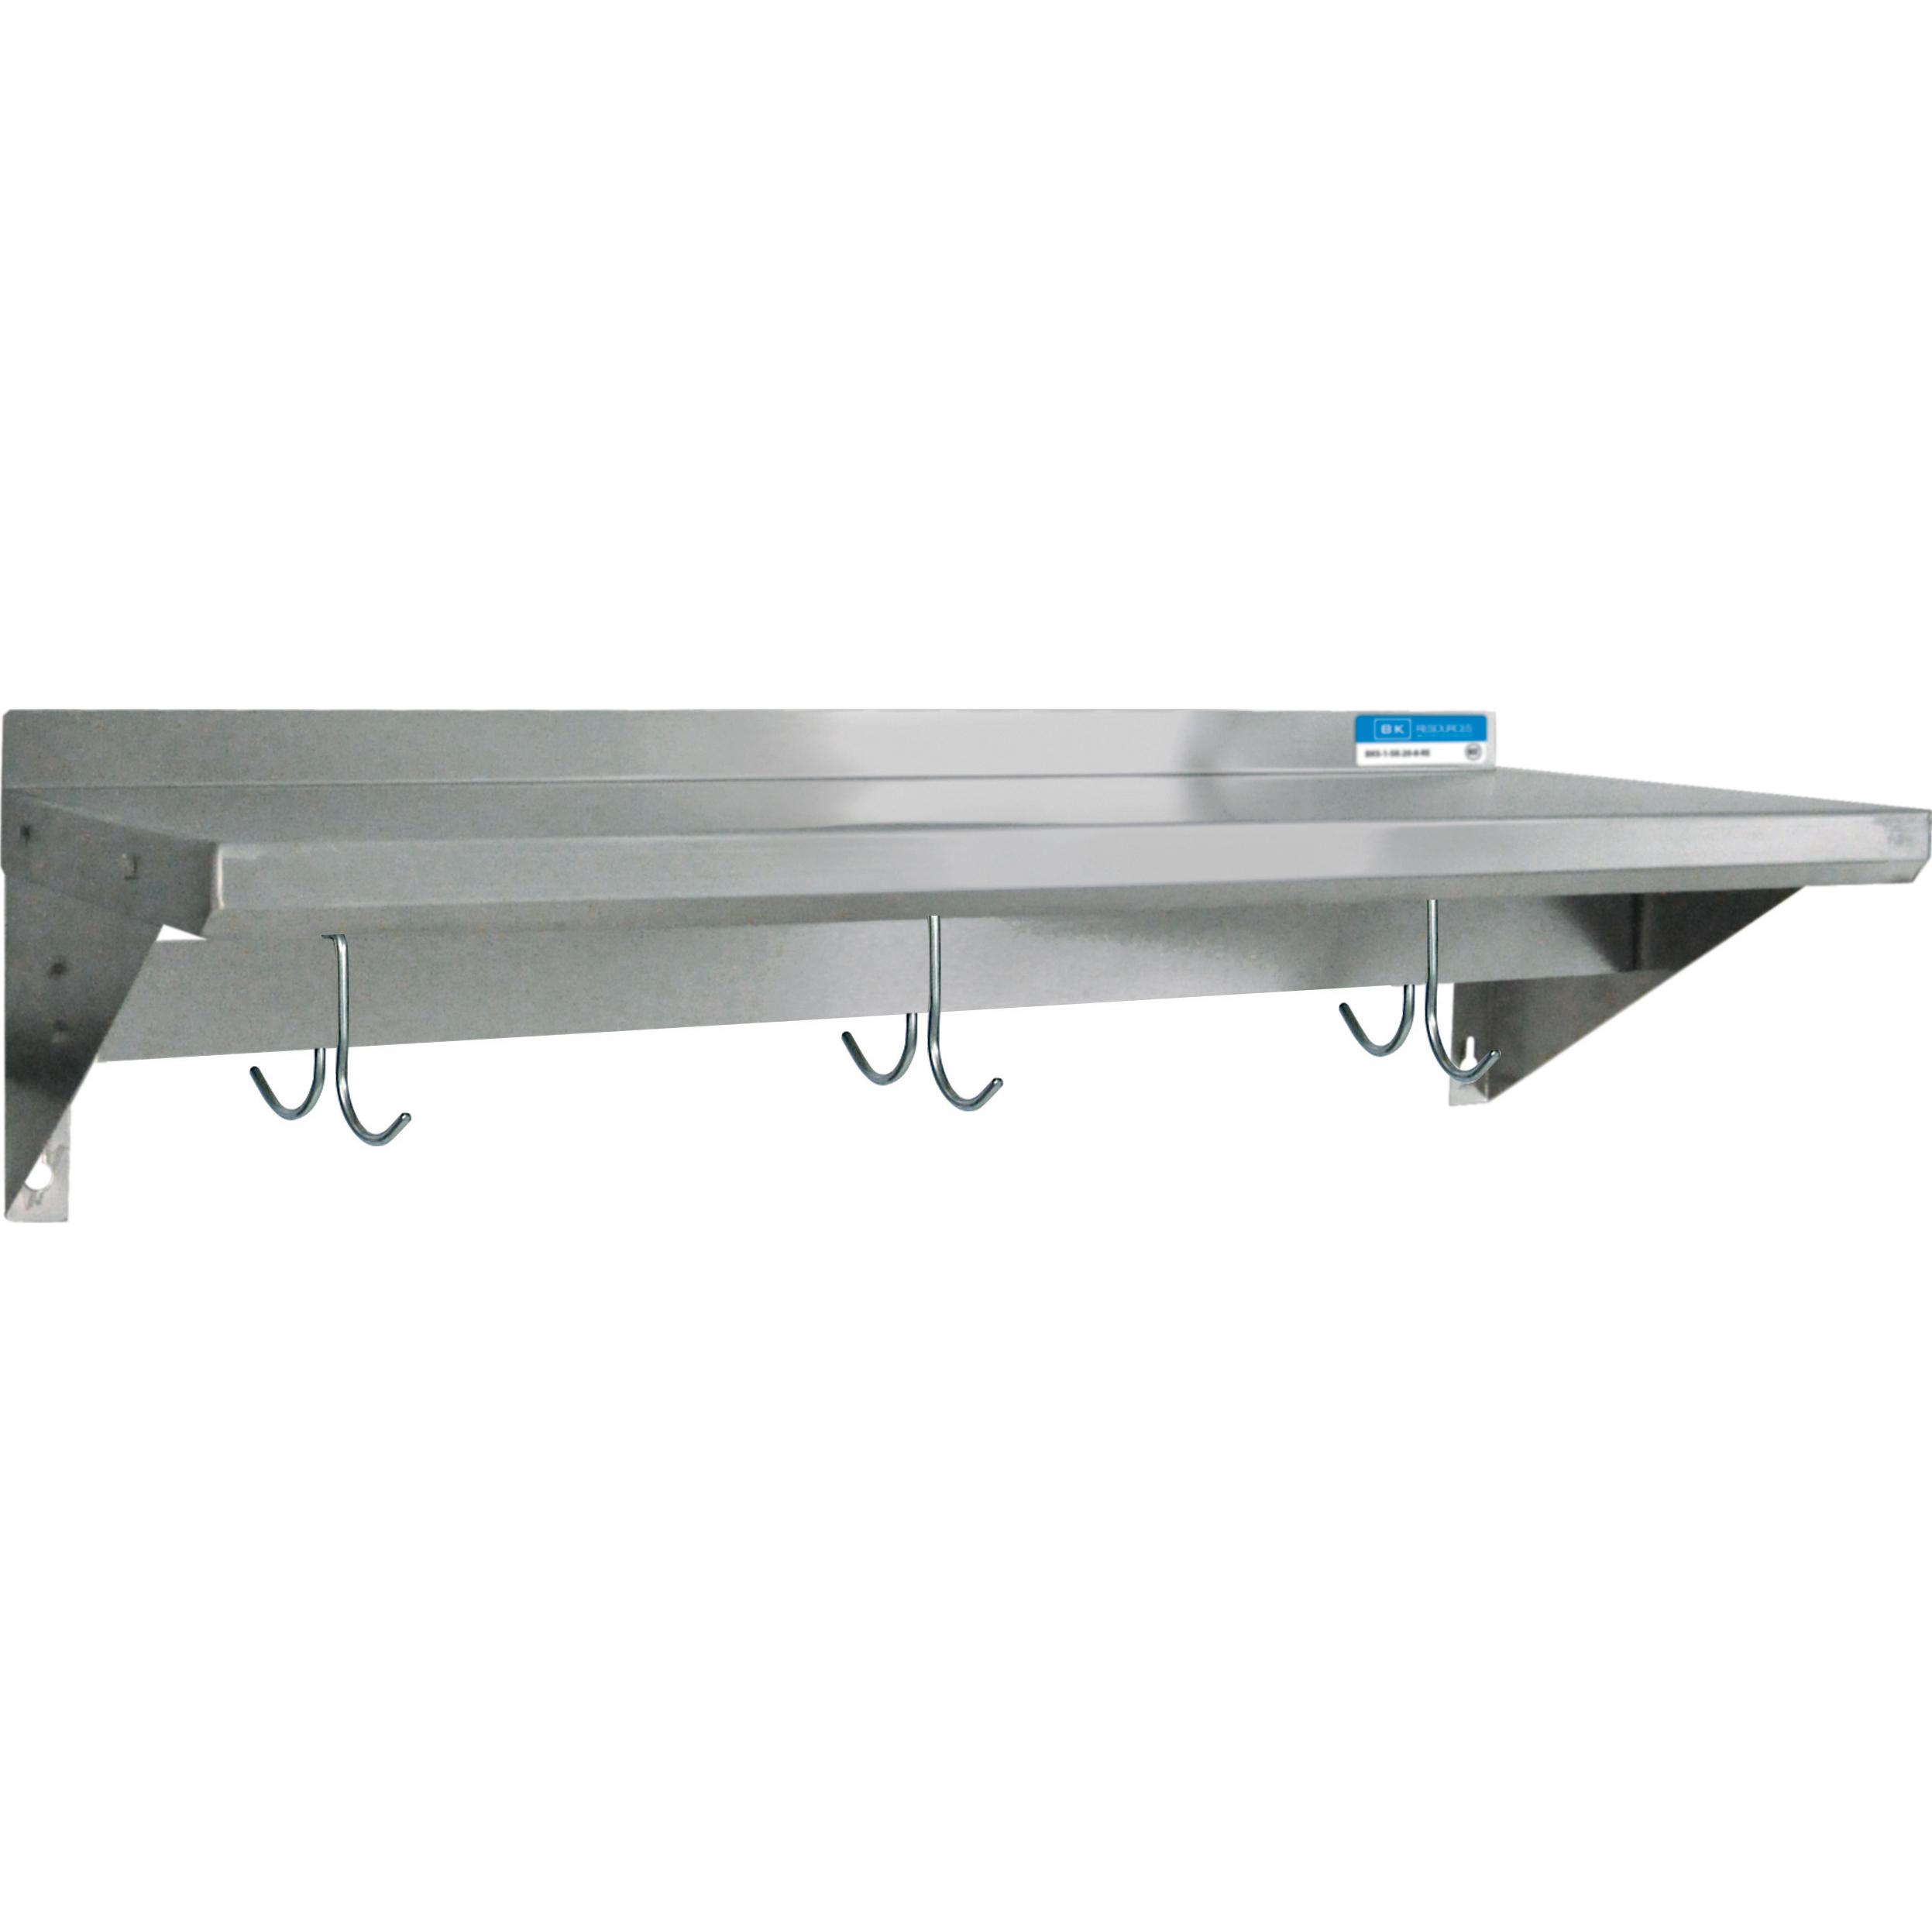 BK Resources BKWS-1624-PR overshelf, wall-mounted with pot rack